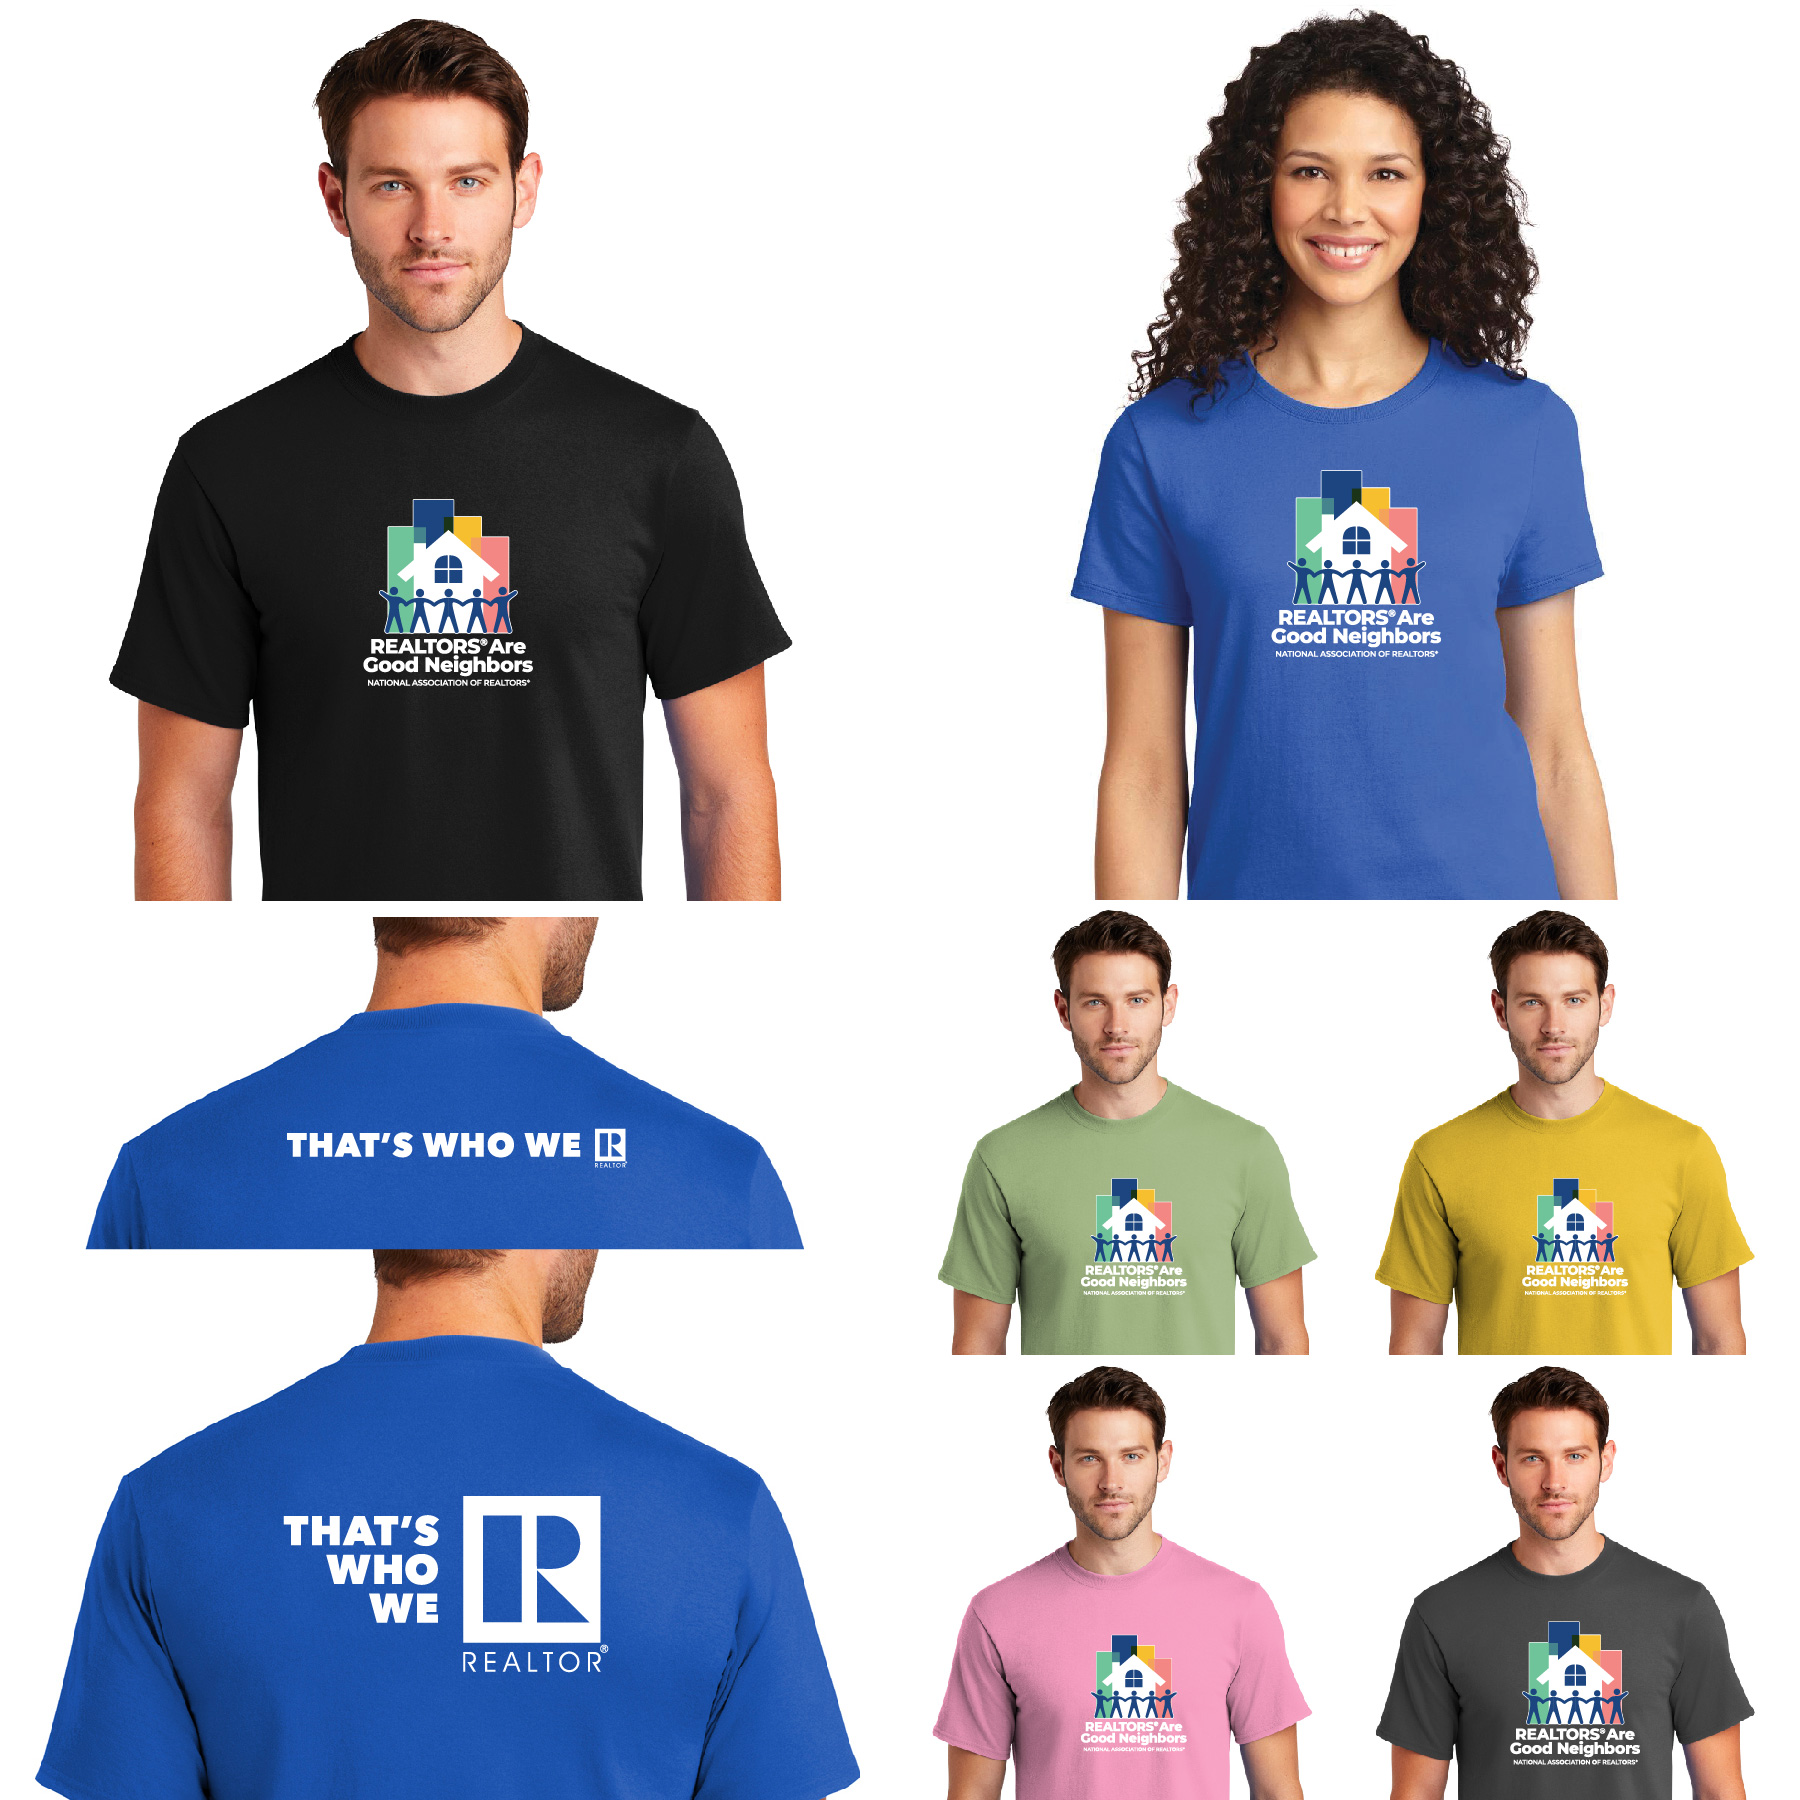 """REALTORS® Are Good Neighbors"" Tee Shirt Goods,neighbors,neghbors,nibors,Neighborhoods,GN,RGN"